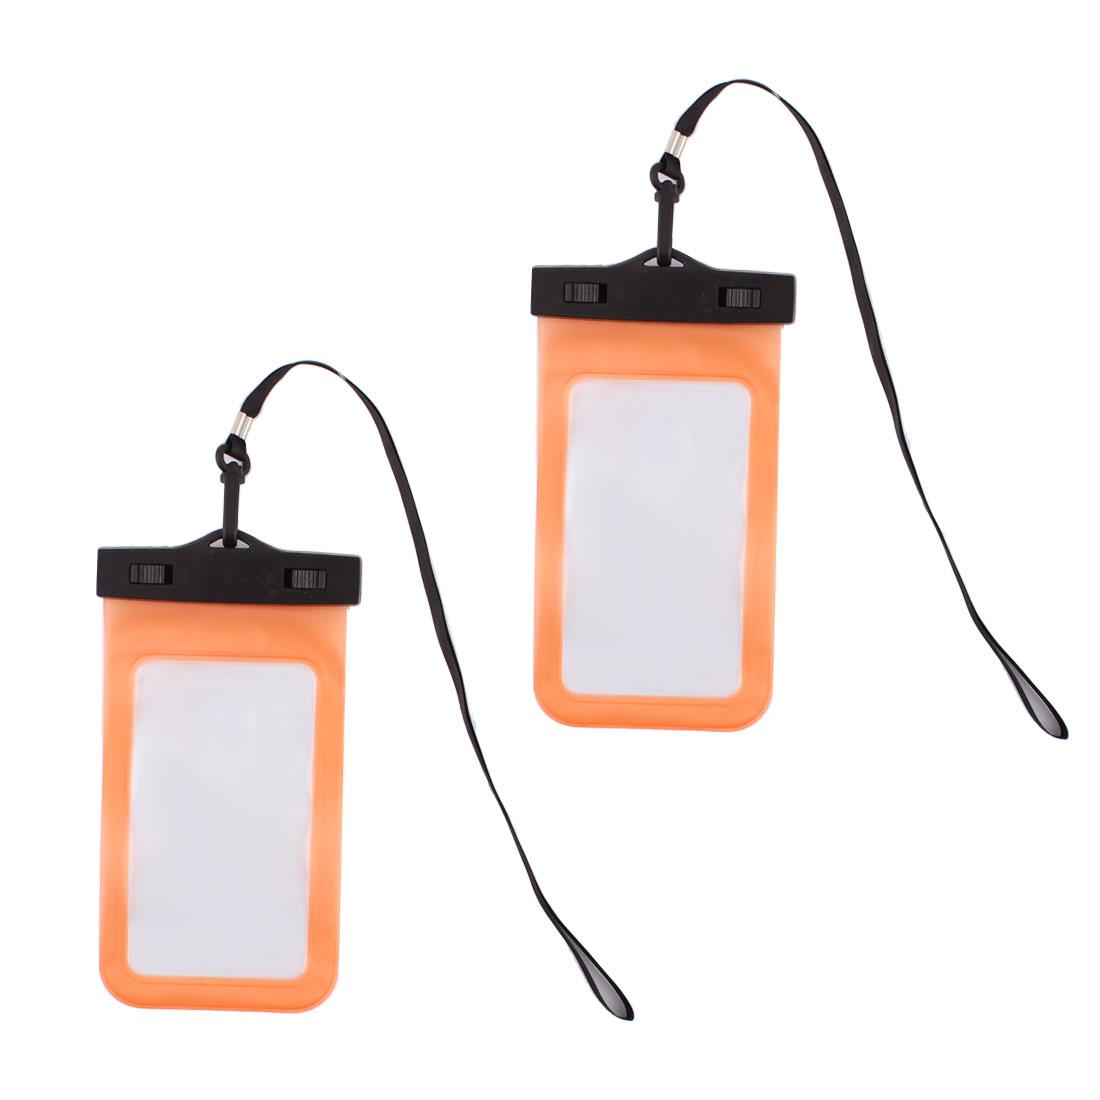 Smart Phone PVC Water Resistant Protector Bag Holder Pouch Orange 2 Pcs